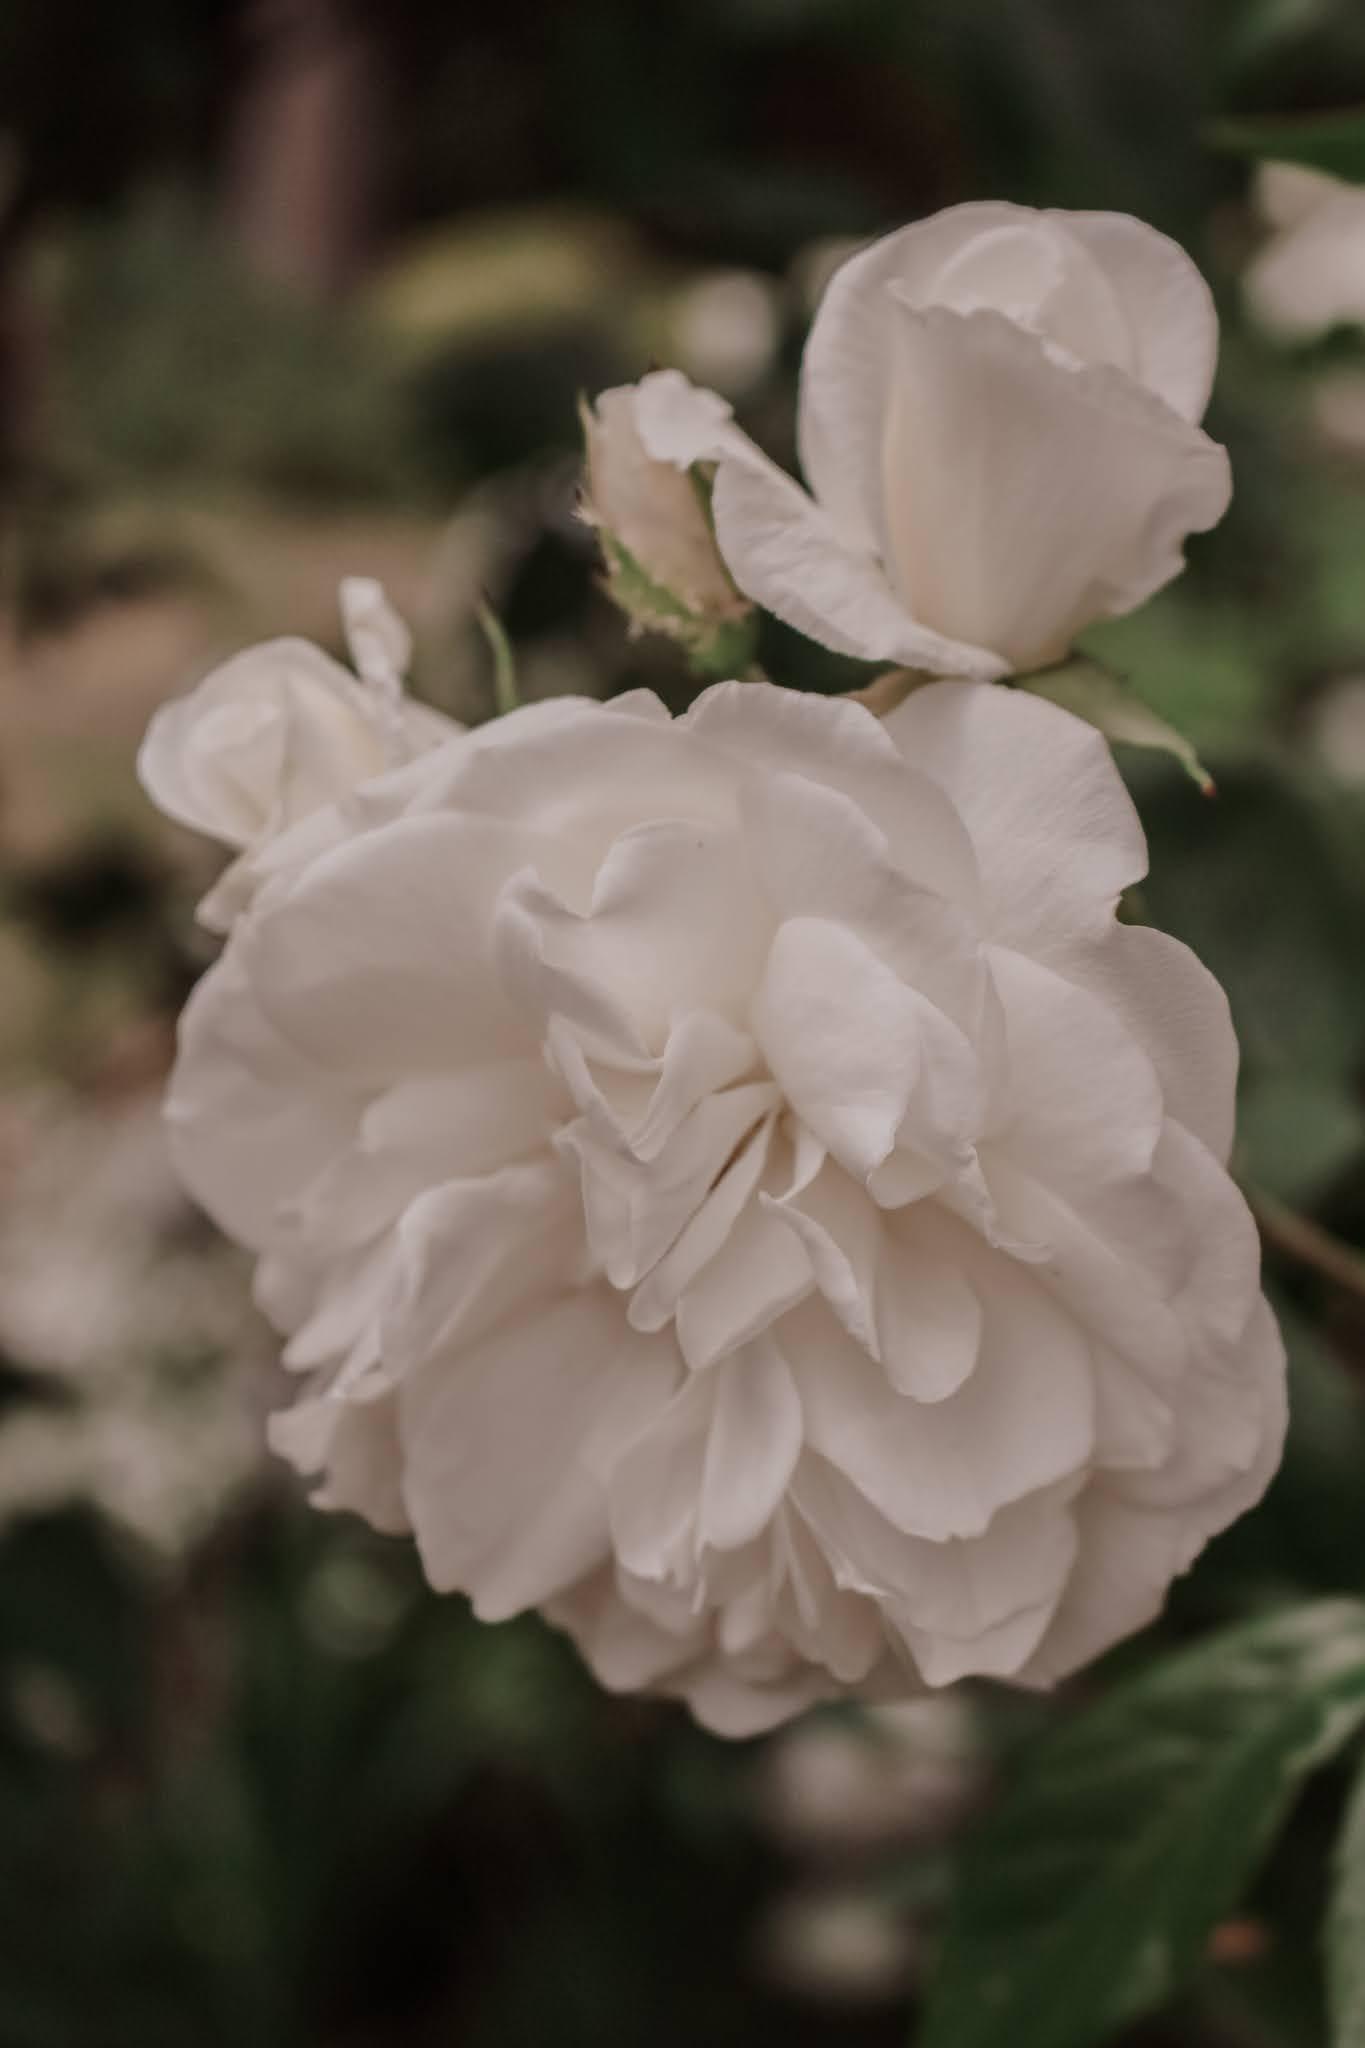 soft white flowers